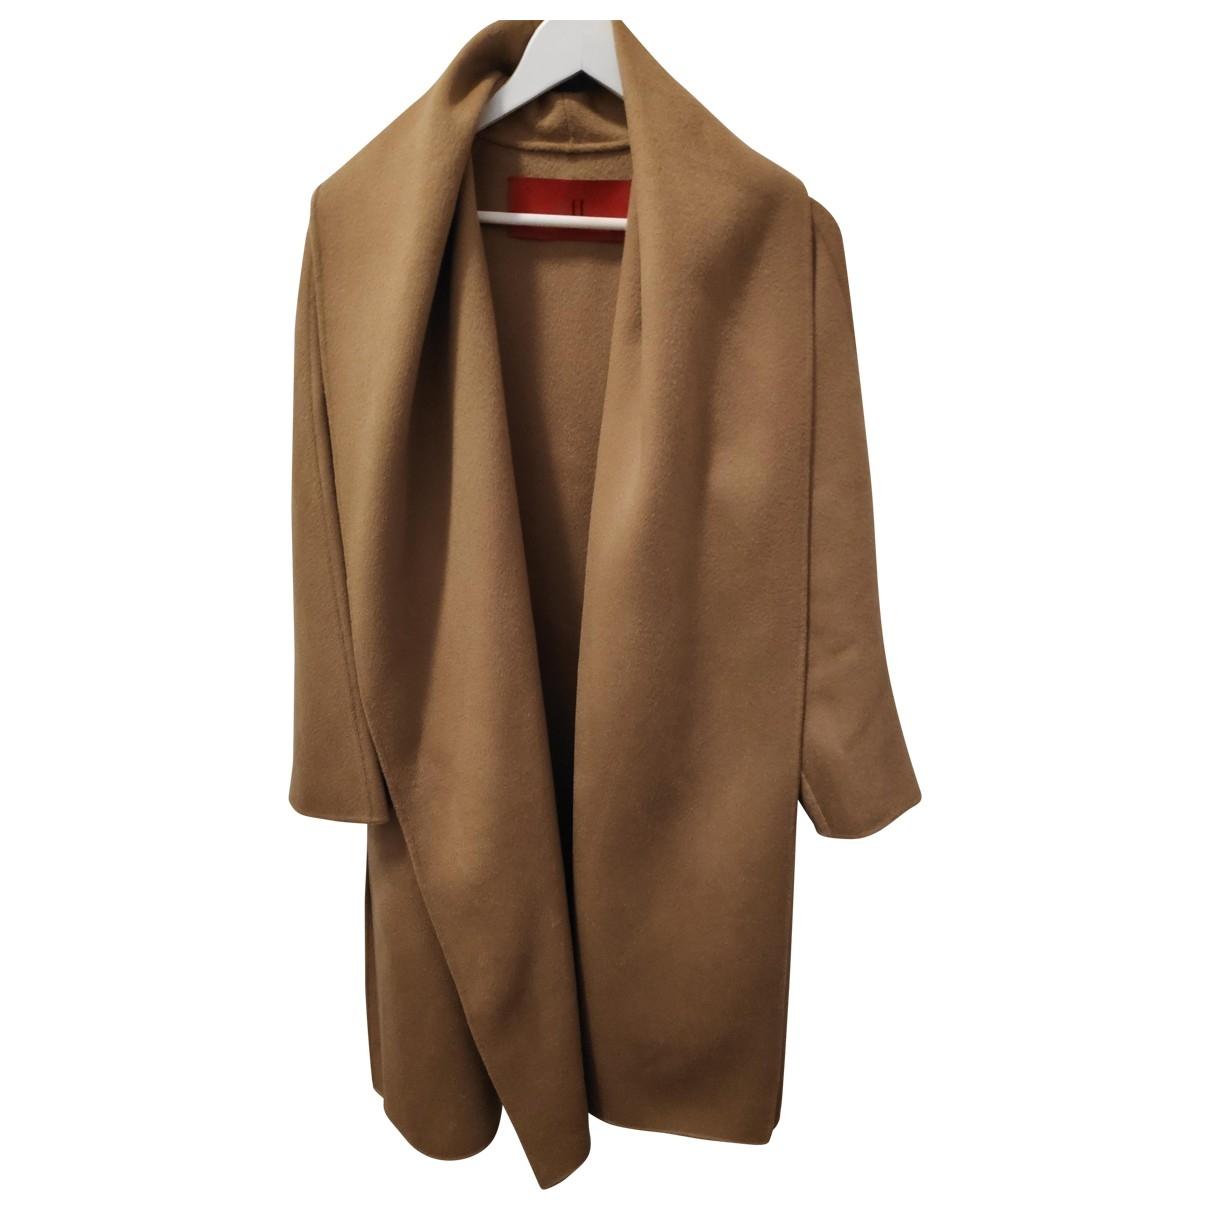 Carolina Herrera \N Camel Wool coat for Women S International